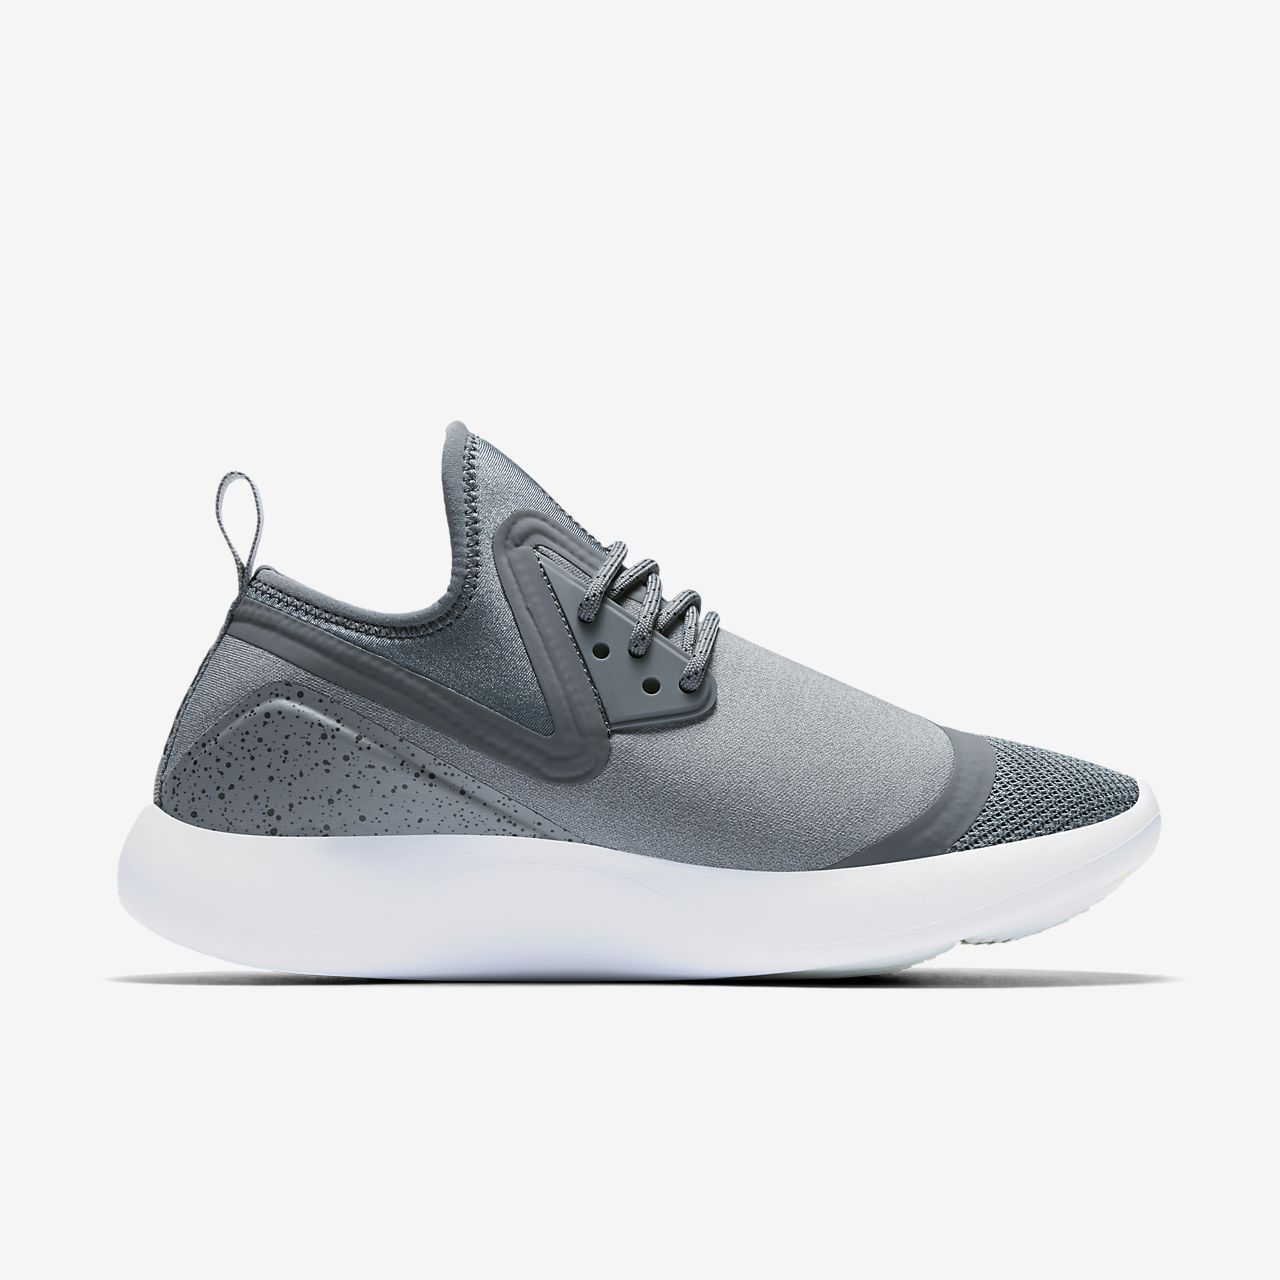 precio de descuento Nike Carga Lunar 9 5 en venta eastbay salida Ve79d11